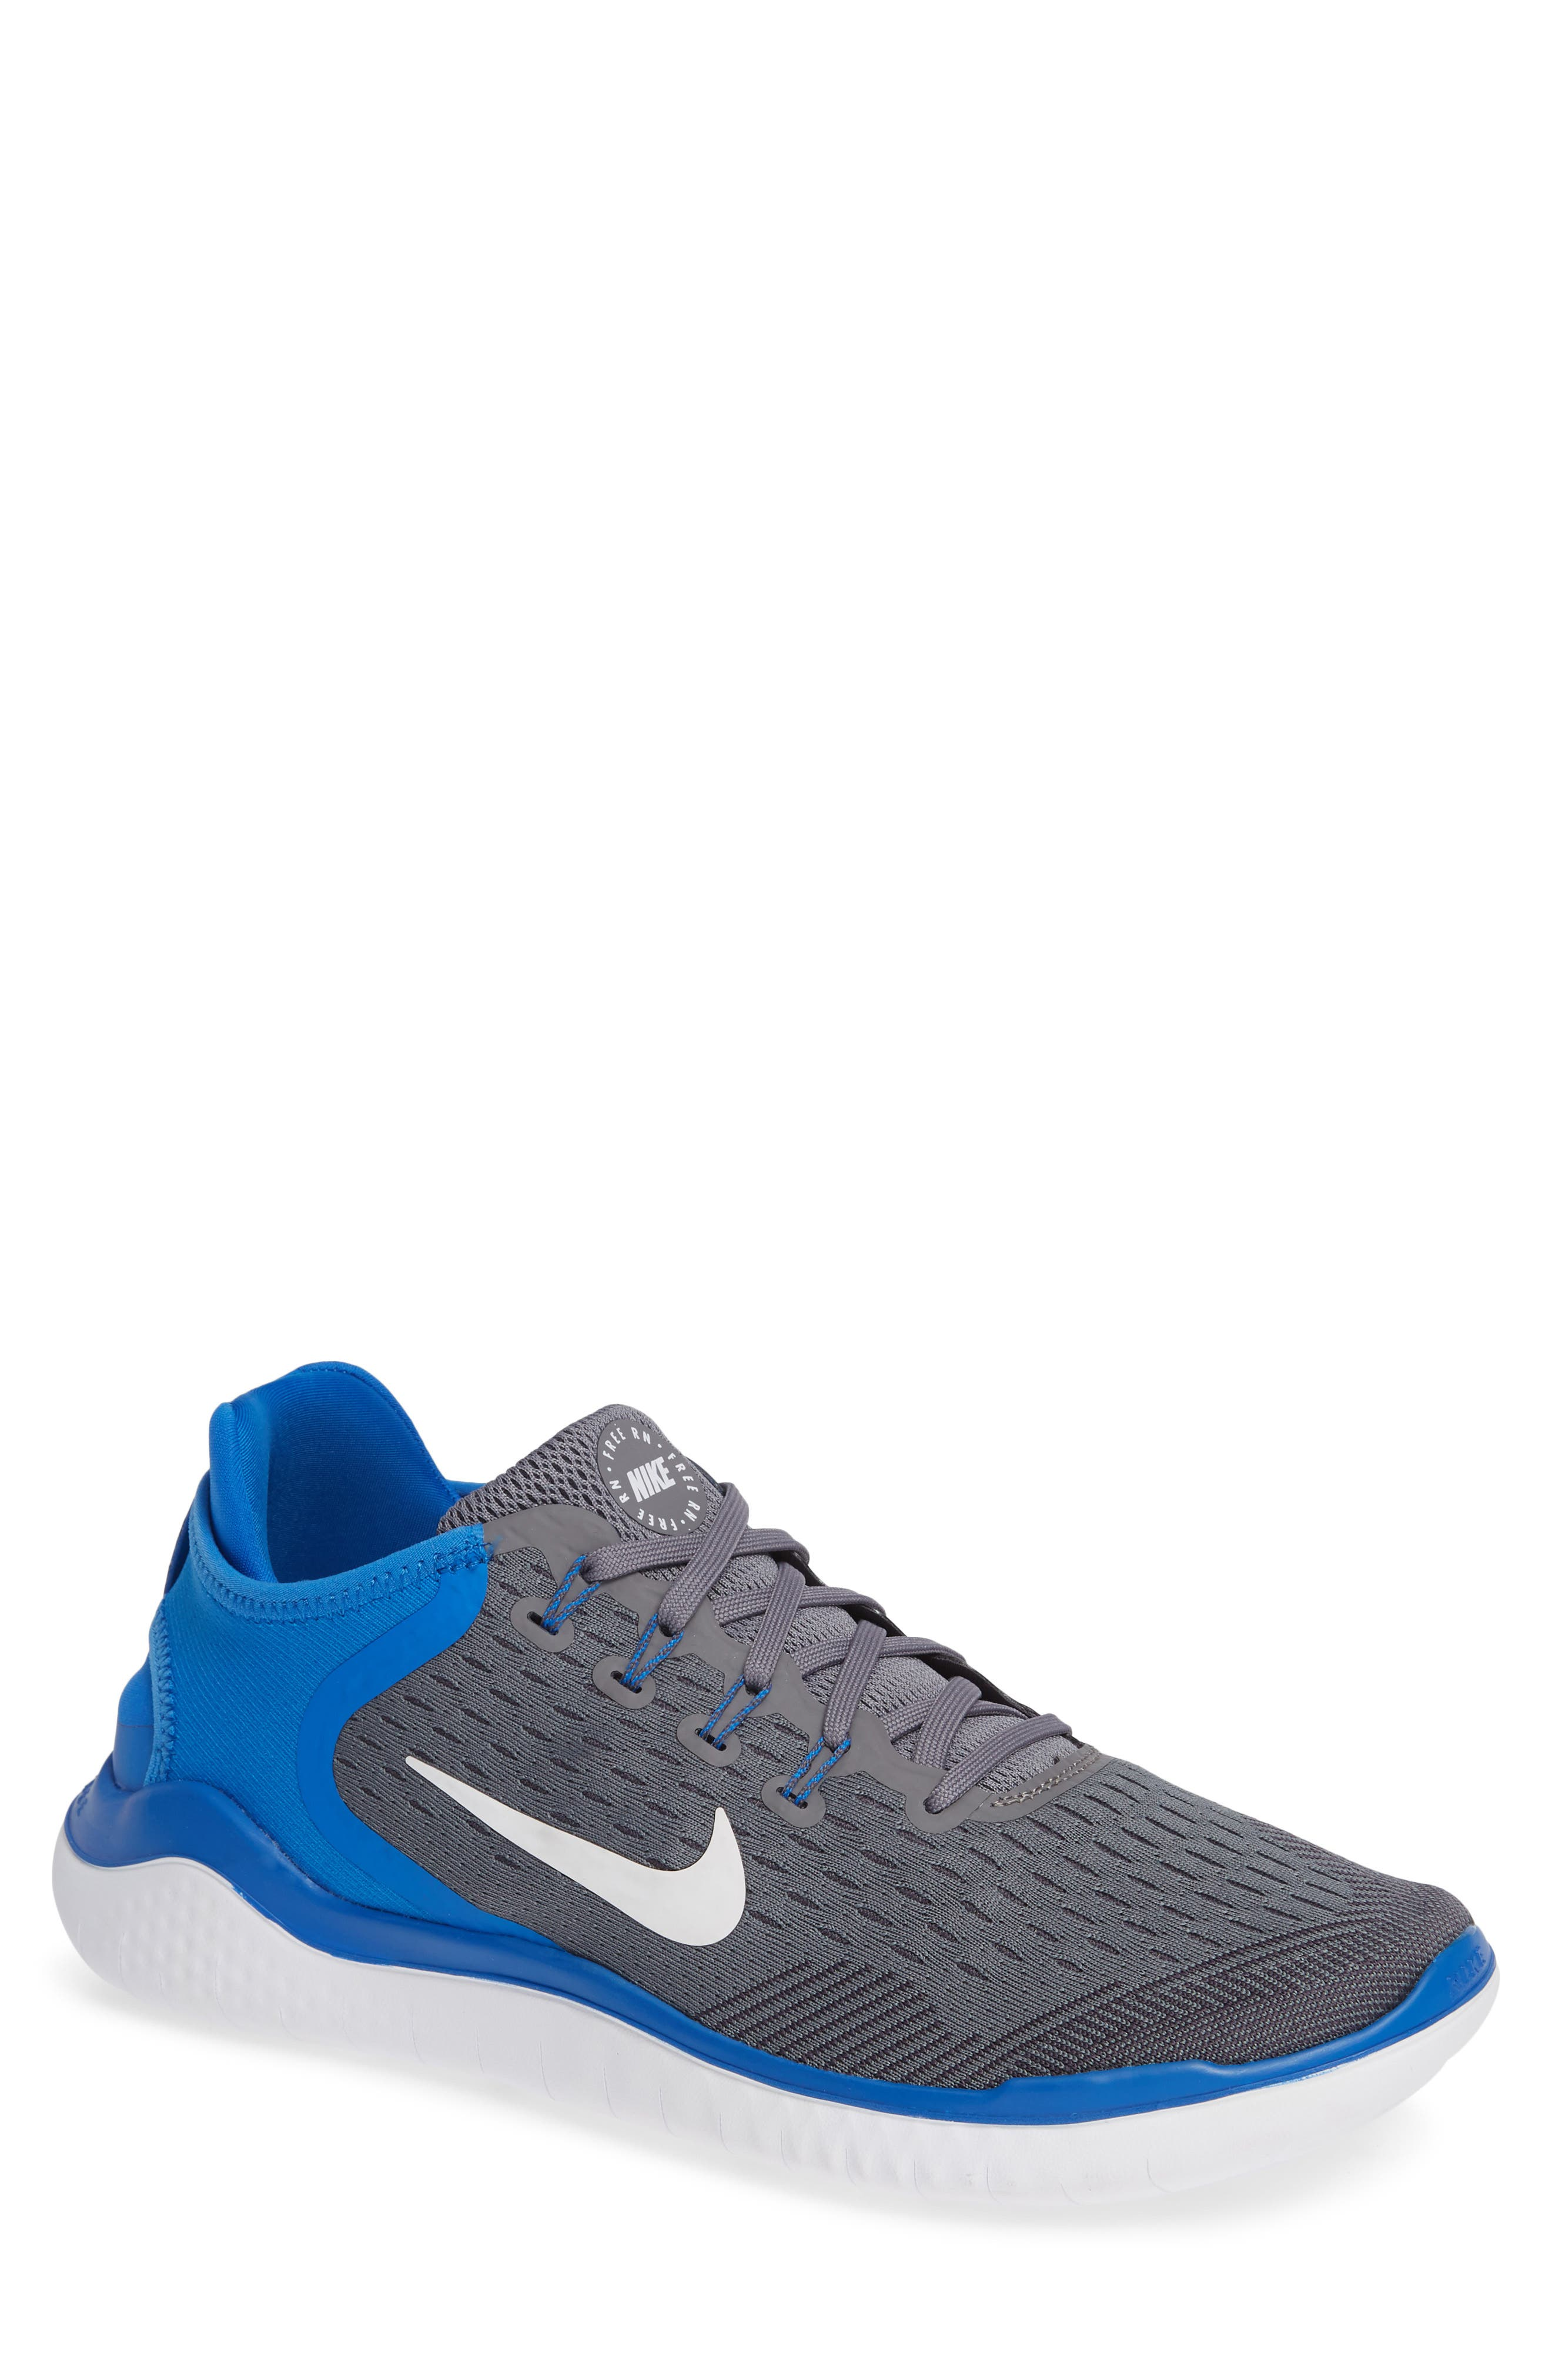 Free RN 2018 Running Shoe,                         Main,                         color, Gunsmoke/ White/ Blue